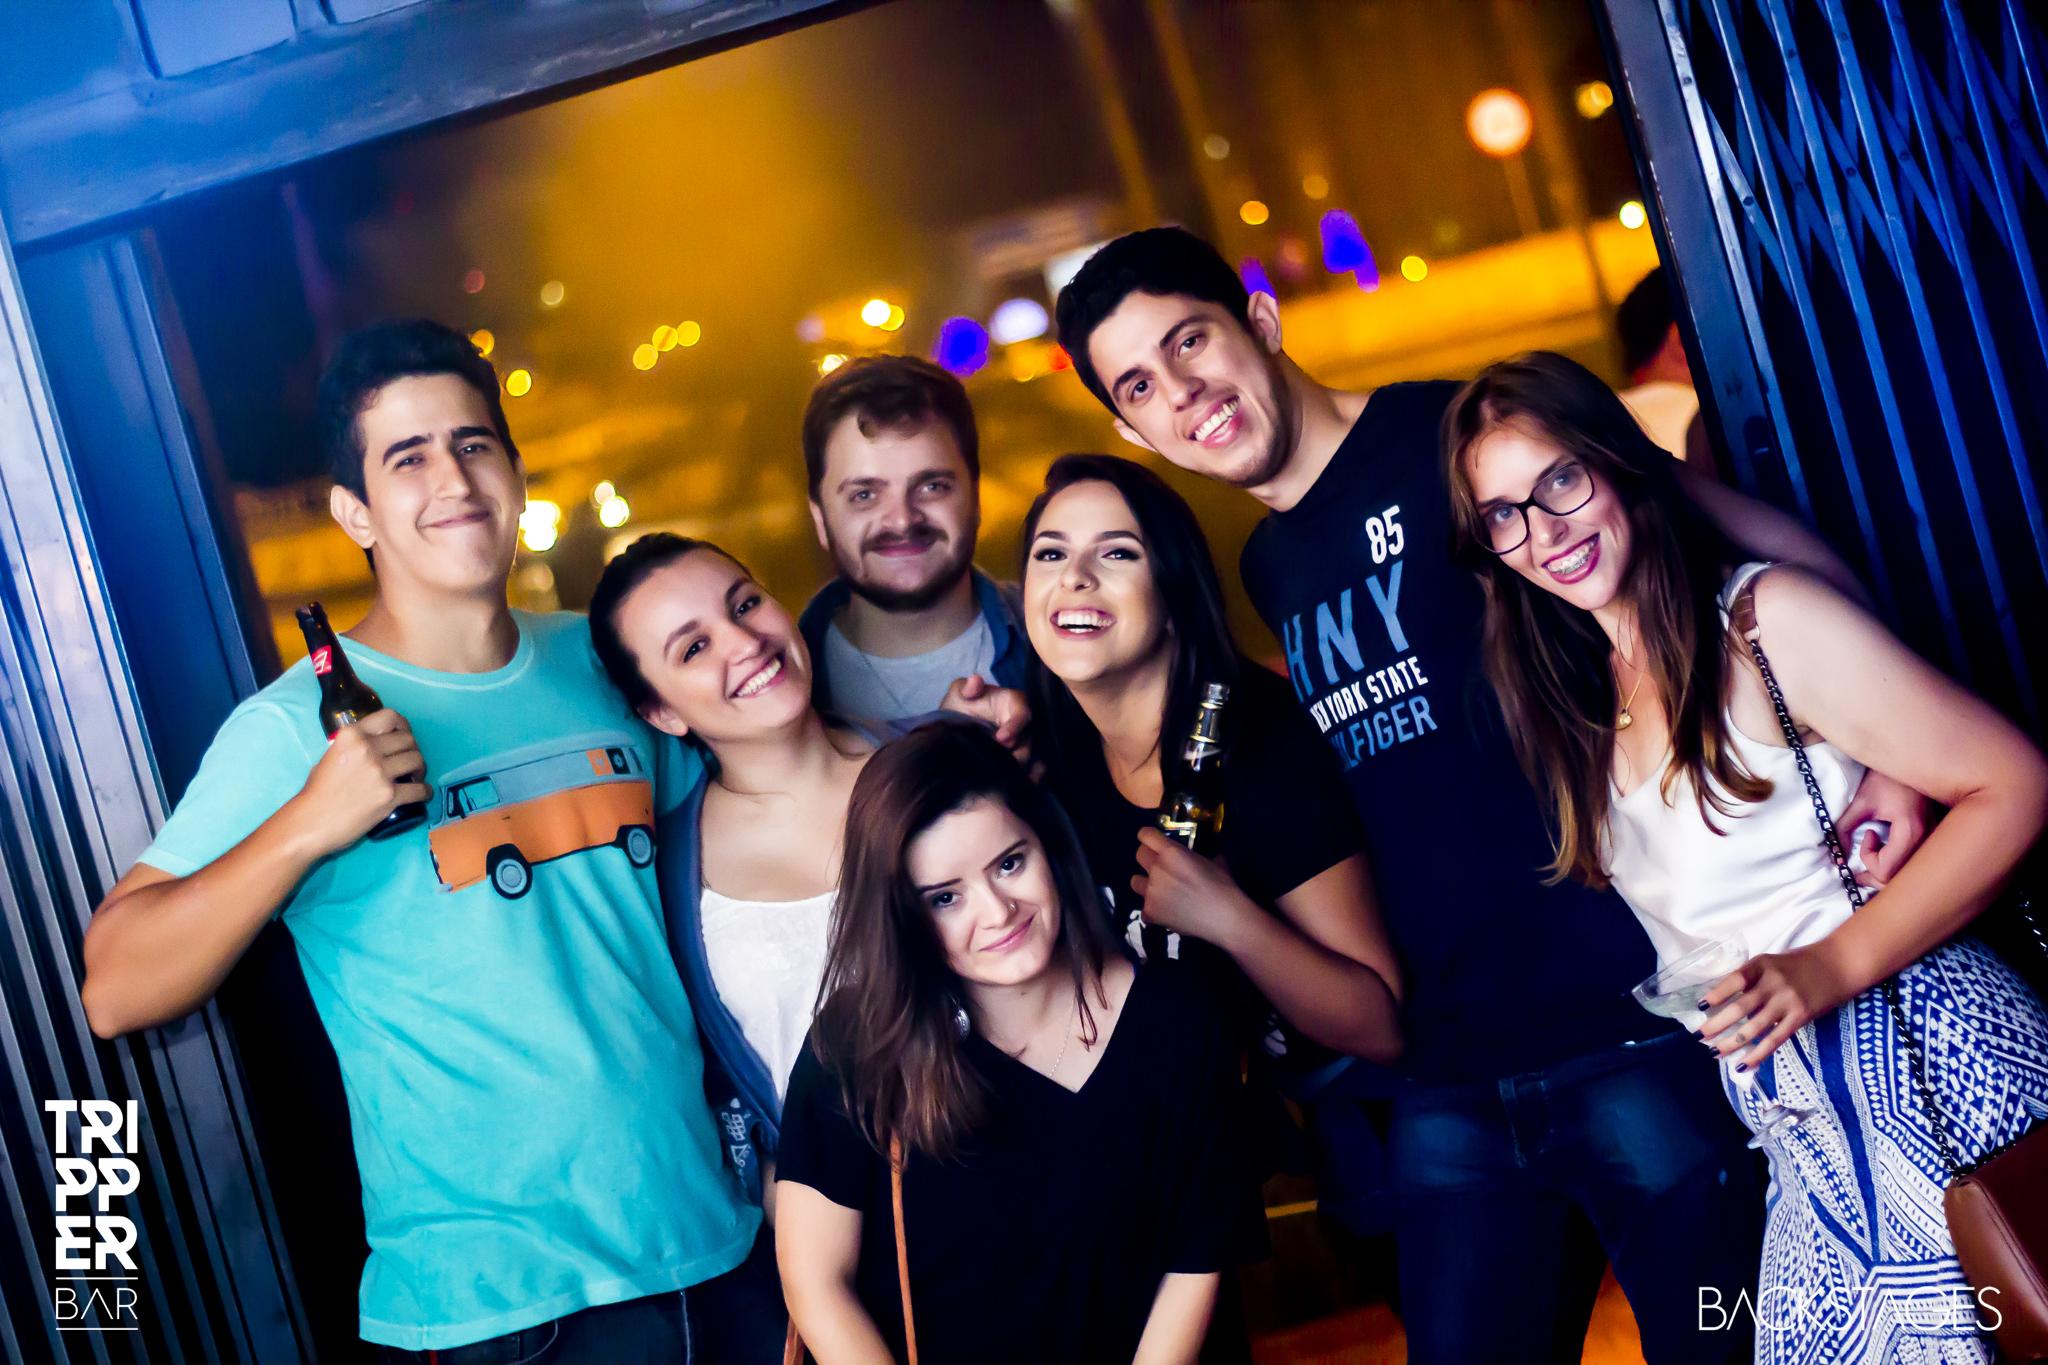 tripper-sorocaba-foto-kenzi-marinho-revista-backstages (36)